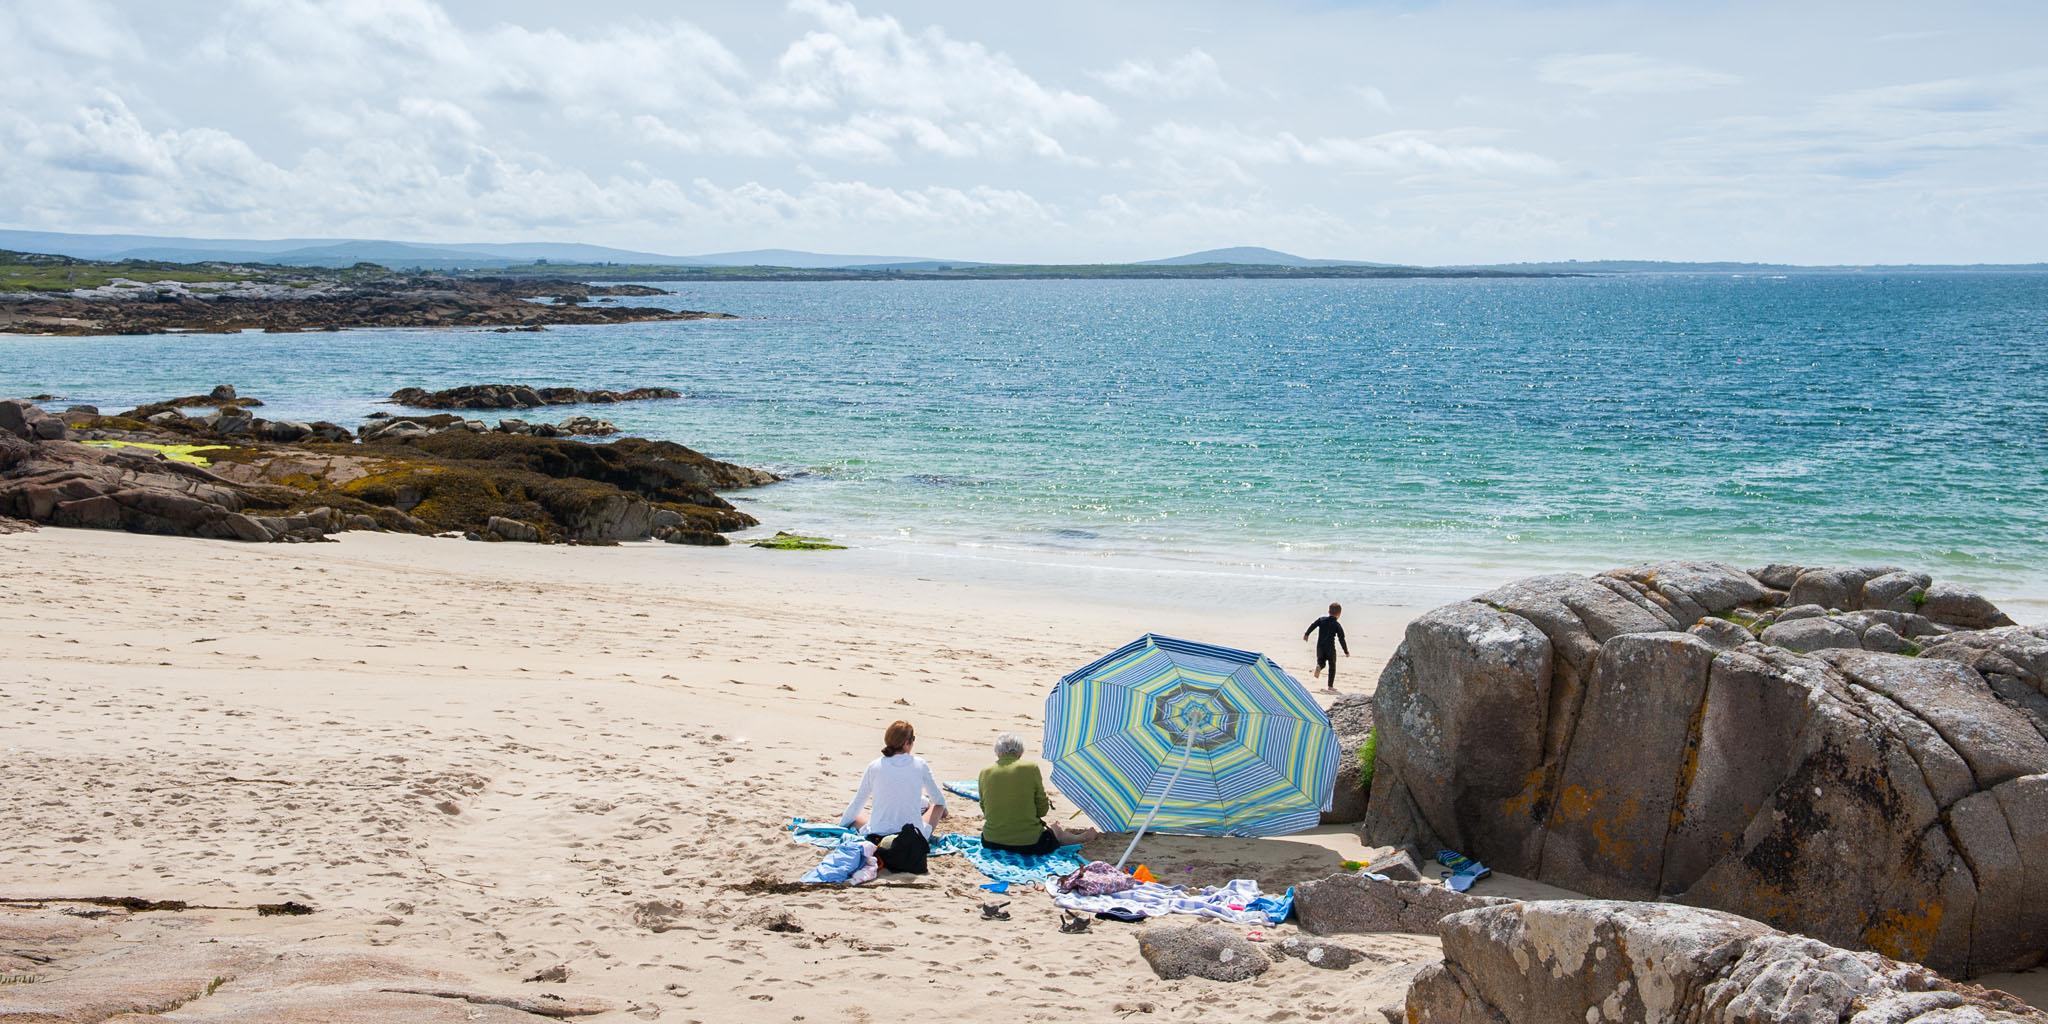 Ireland beach, Galway ireland  |Galway Beaches